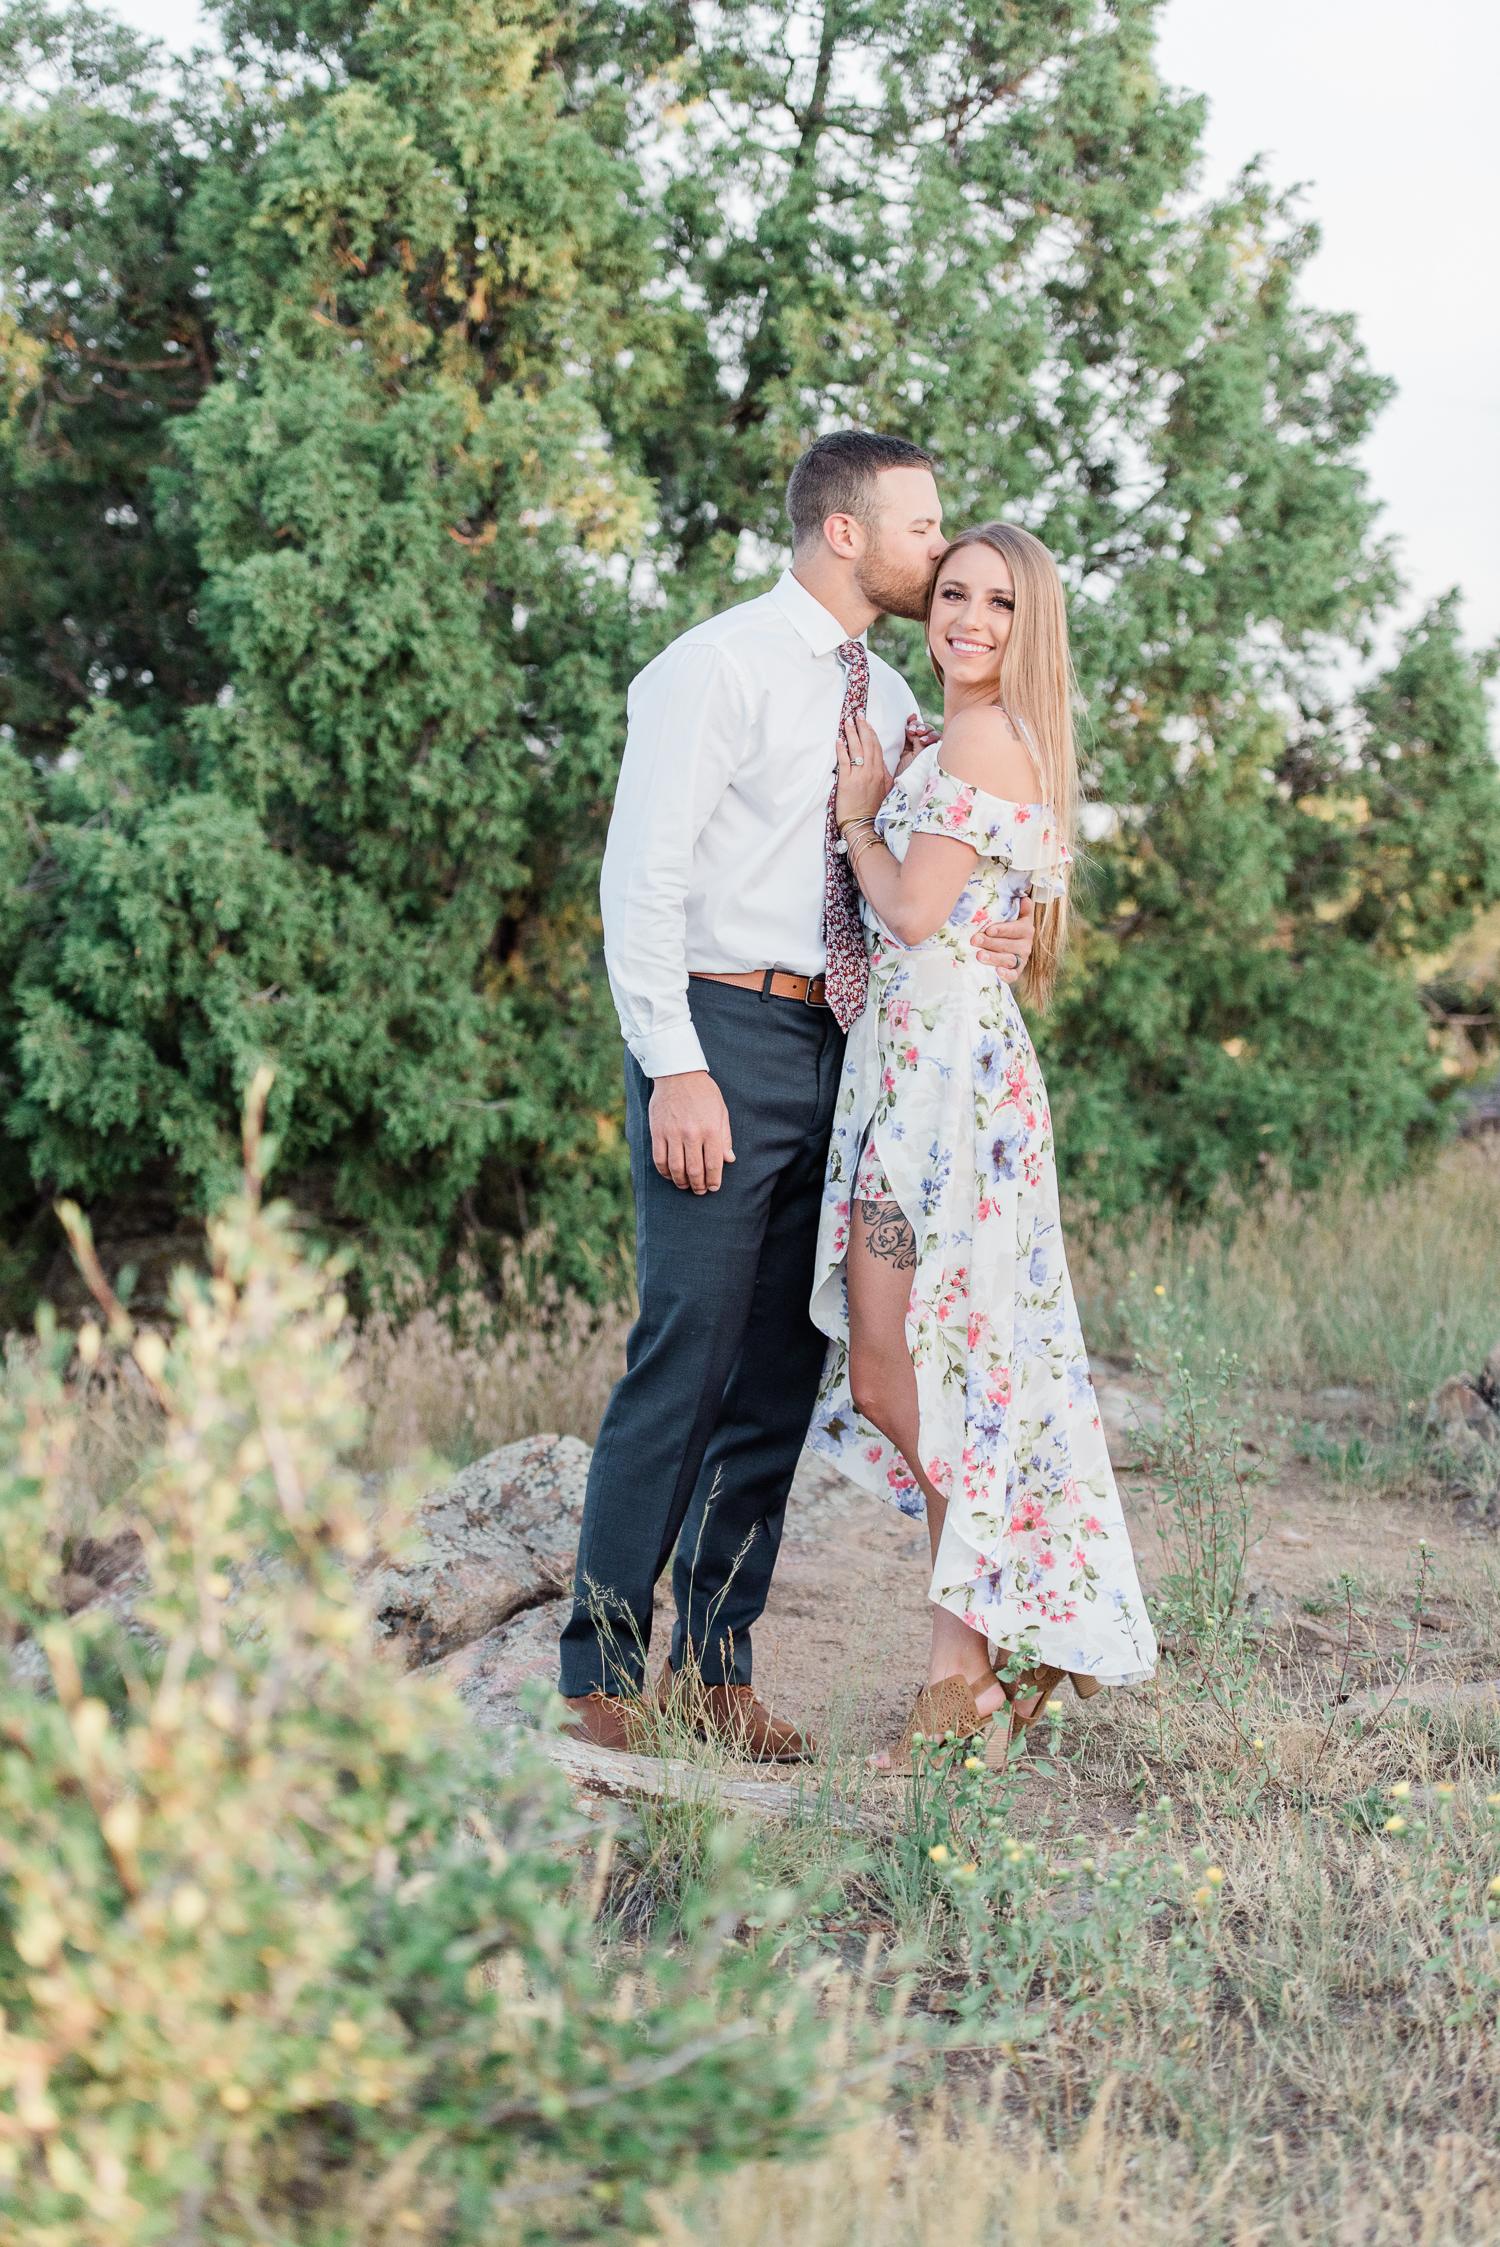 2019-08-30-Engagement-Morgan-Adam-MtFalcon-1313.jpg